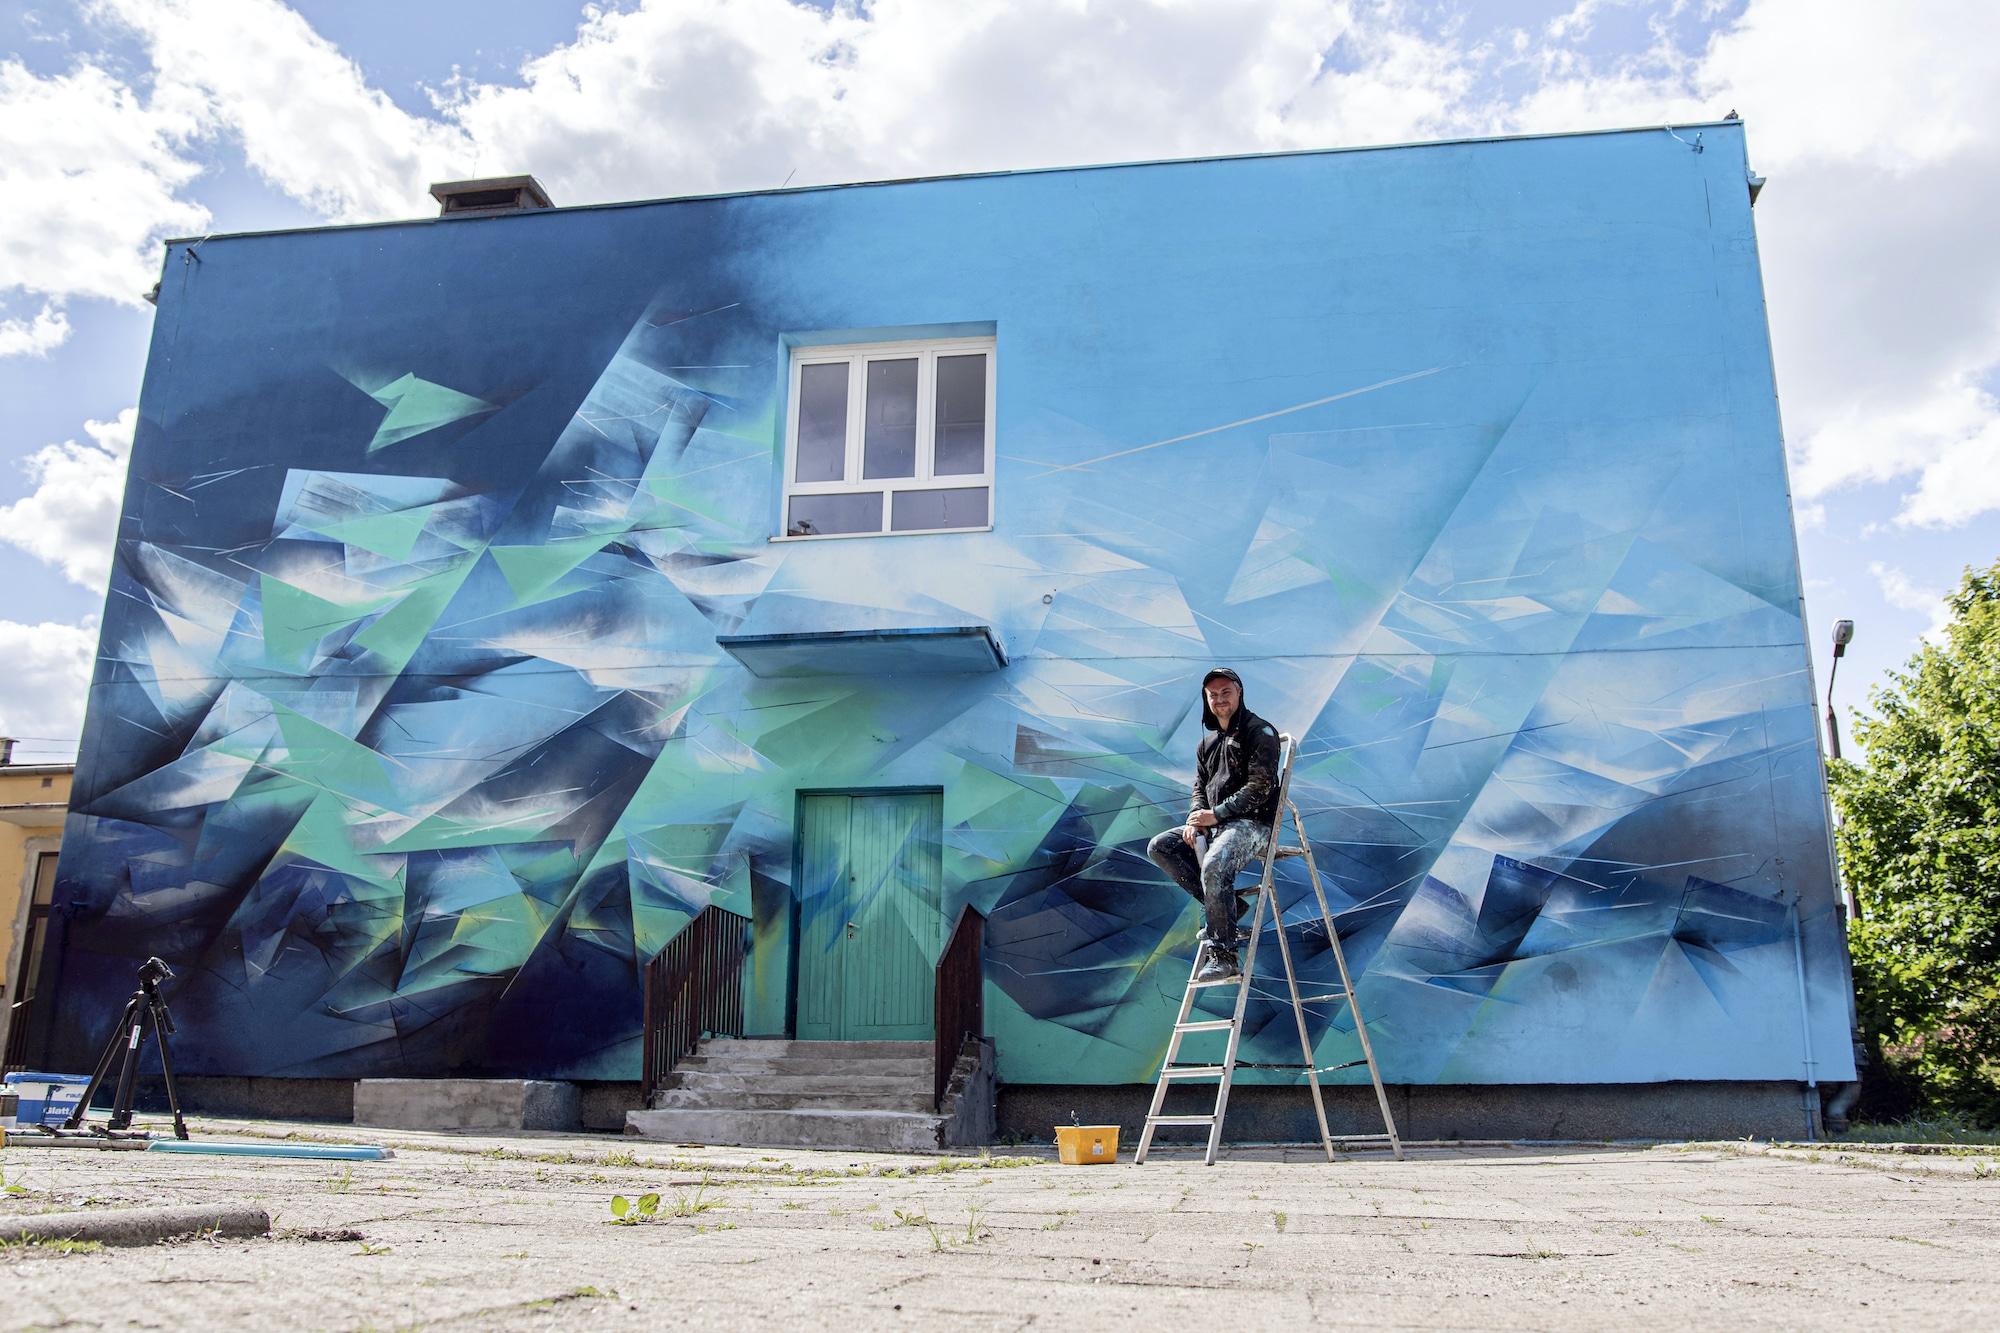 Mirror Land Street Art by Pener